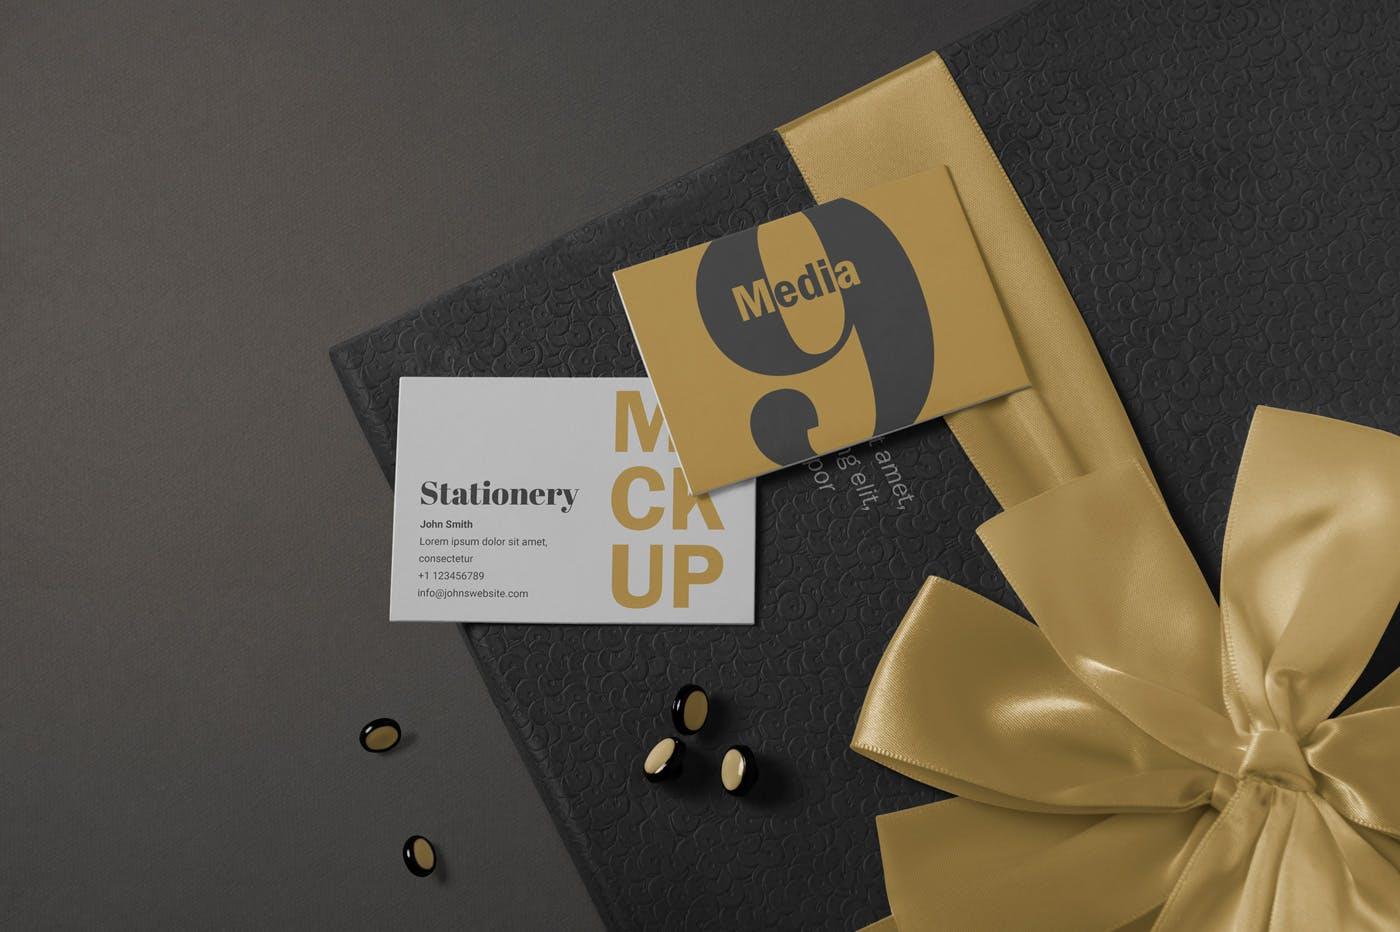 高端精致品牌VI样机展示模板素材Letterhead & Business Card Mockups